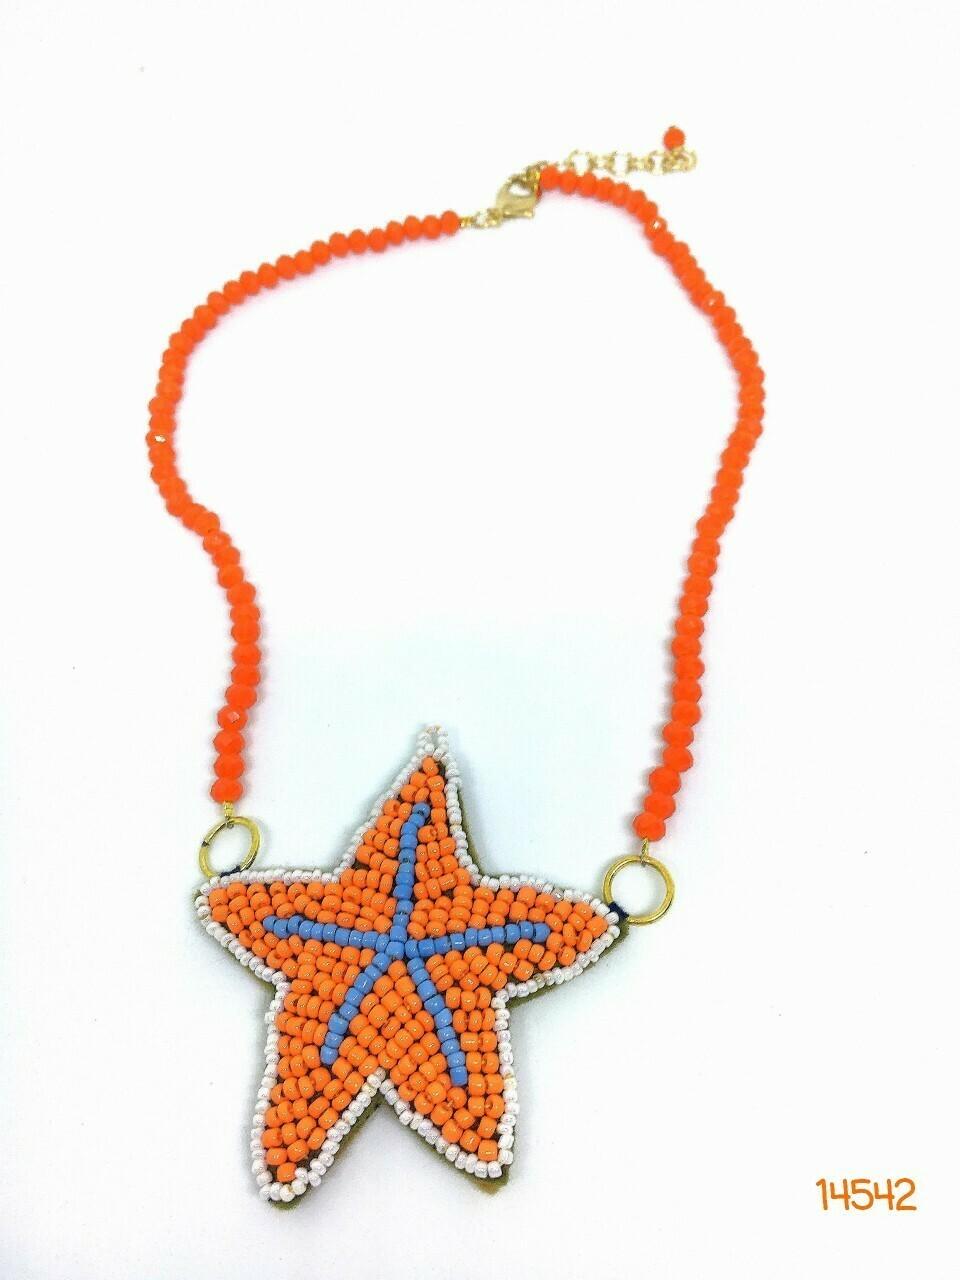 Sensational Starfish Necklace